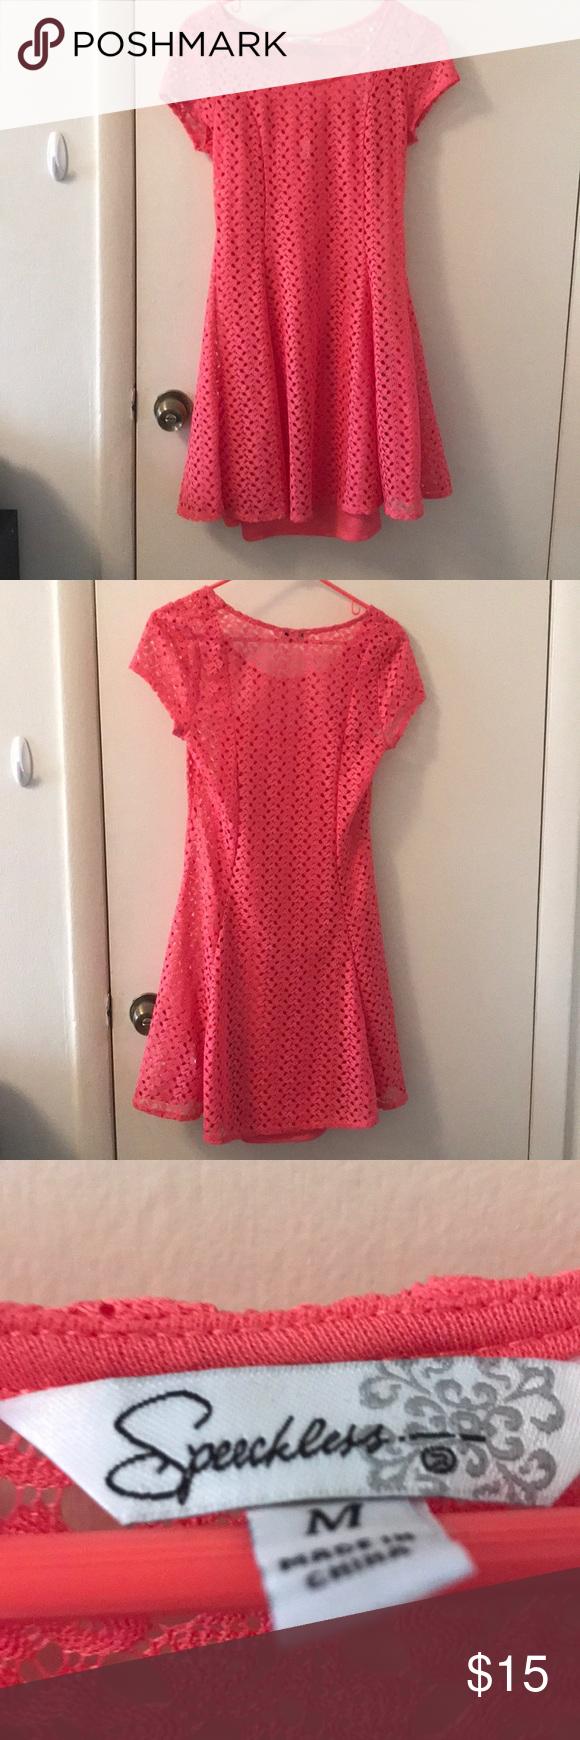 34++ Macys coral dress info